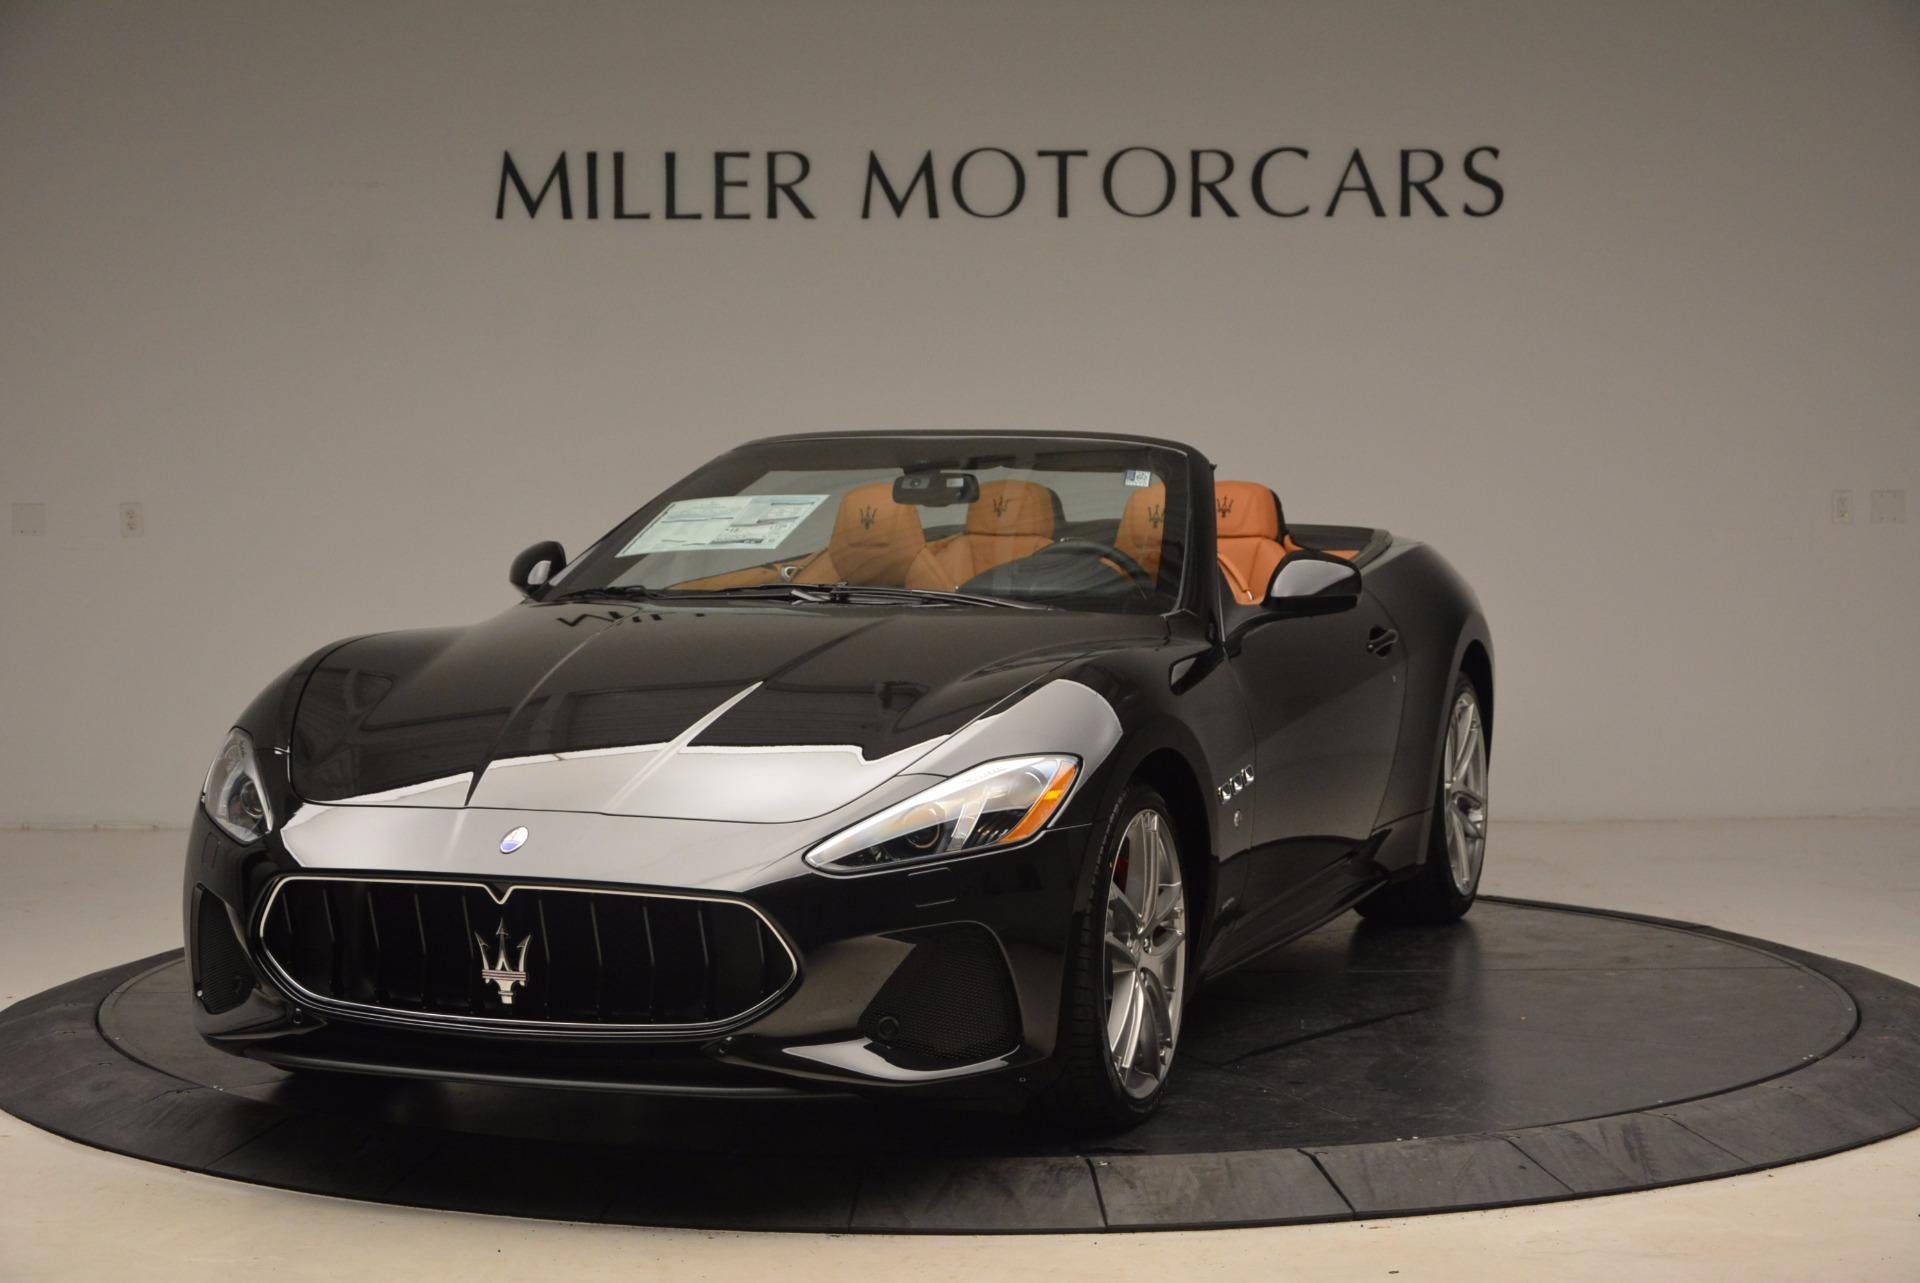 New 2018 Maserati GranTurismo Sport Convertible For Sale In Westport, CT 1795_main